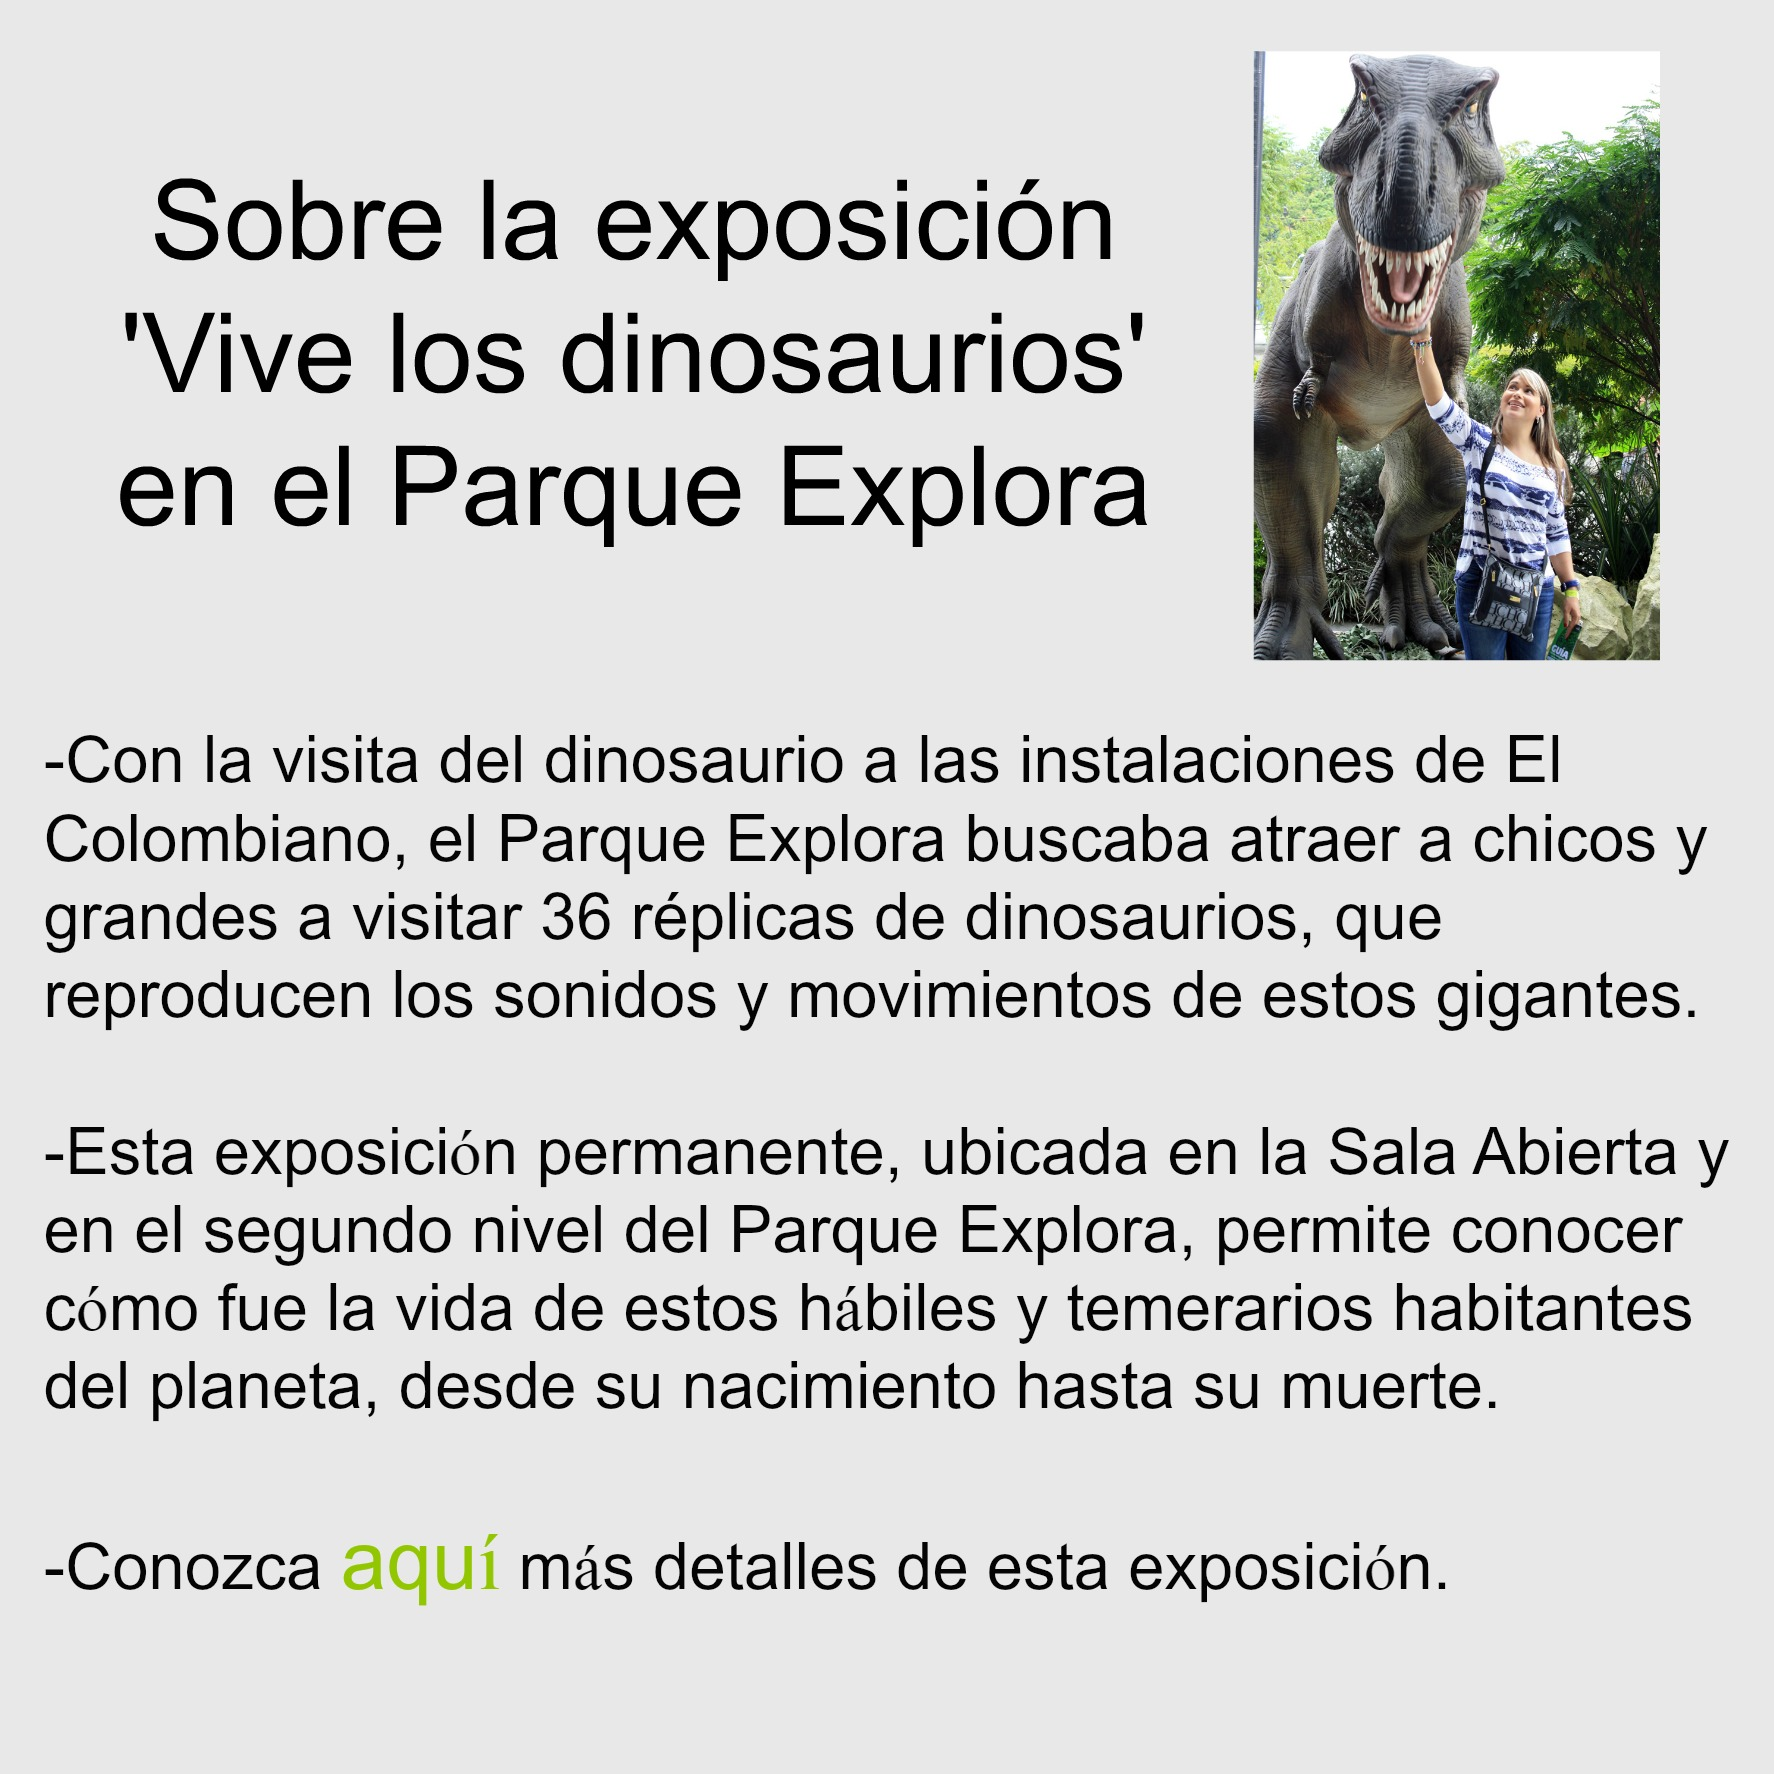 Foto tomada del sitio: parqueexplora.org